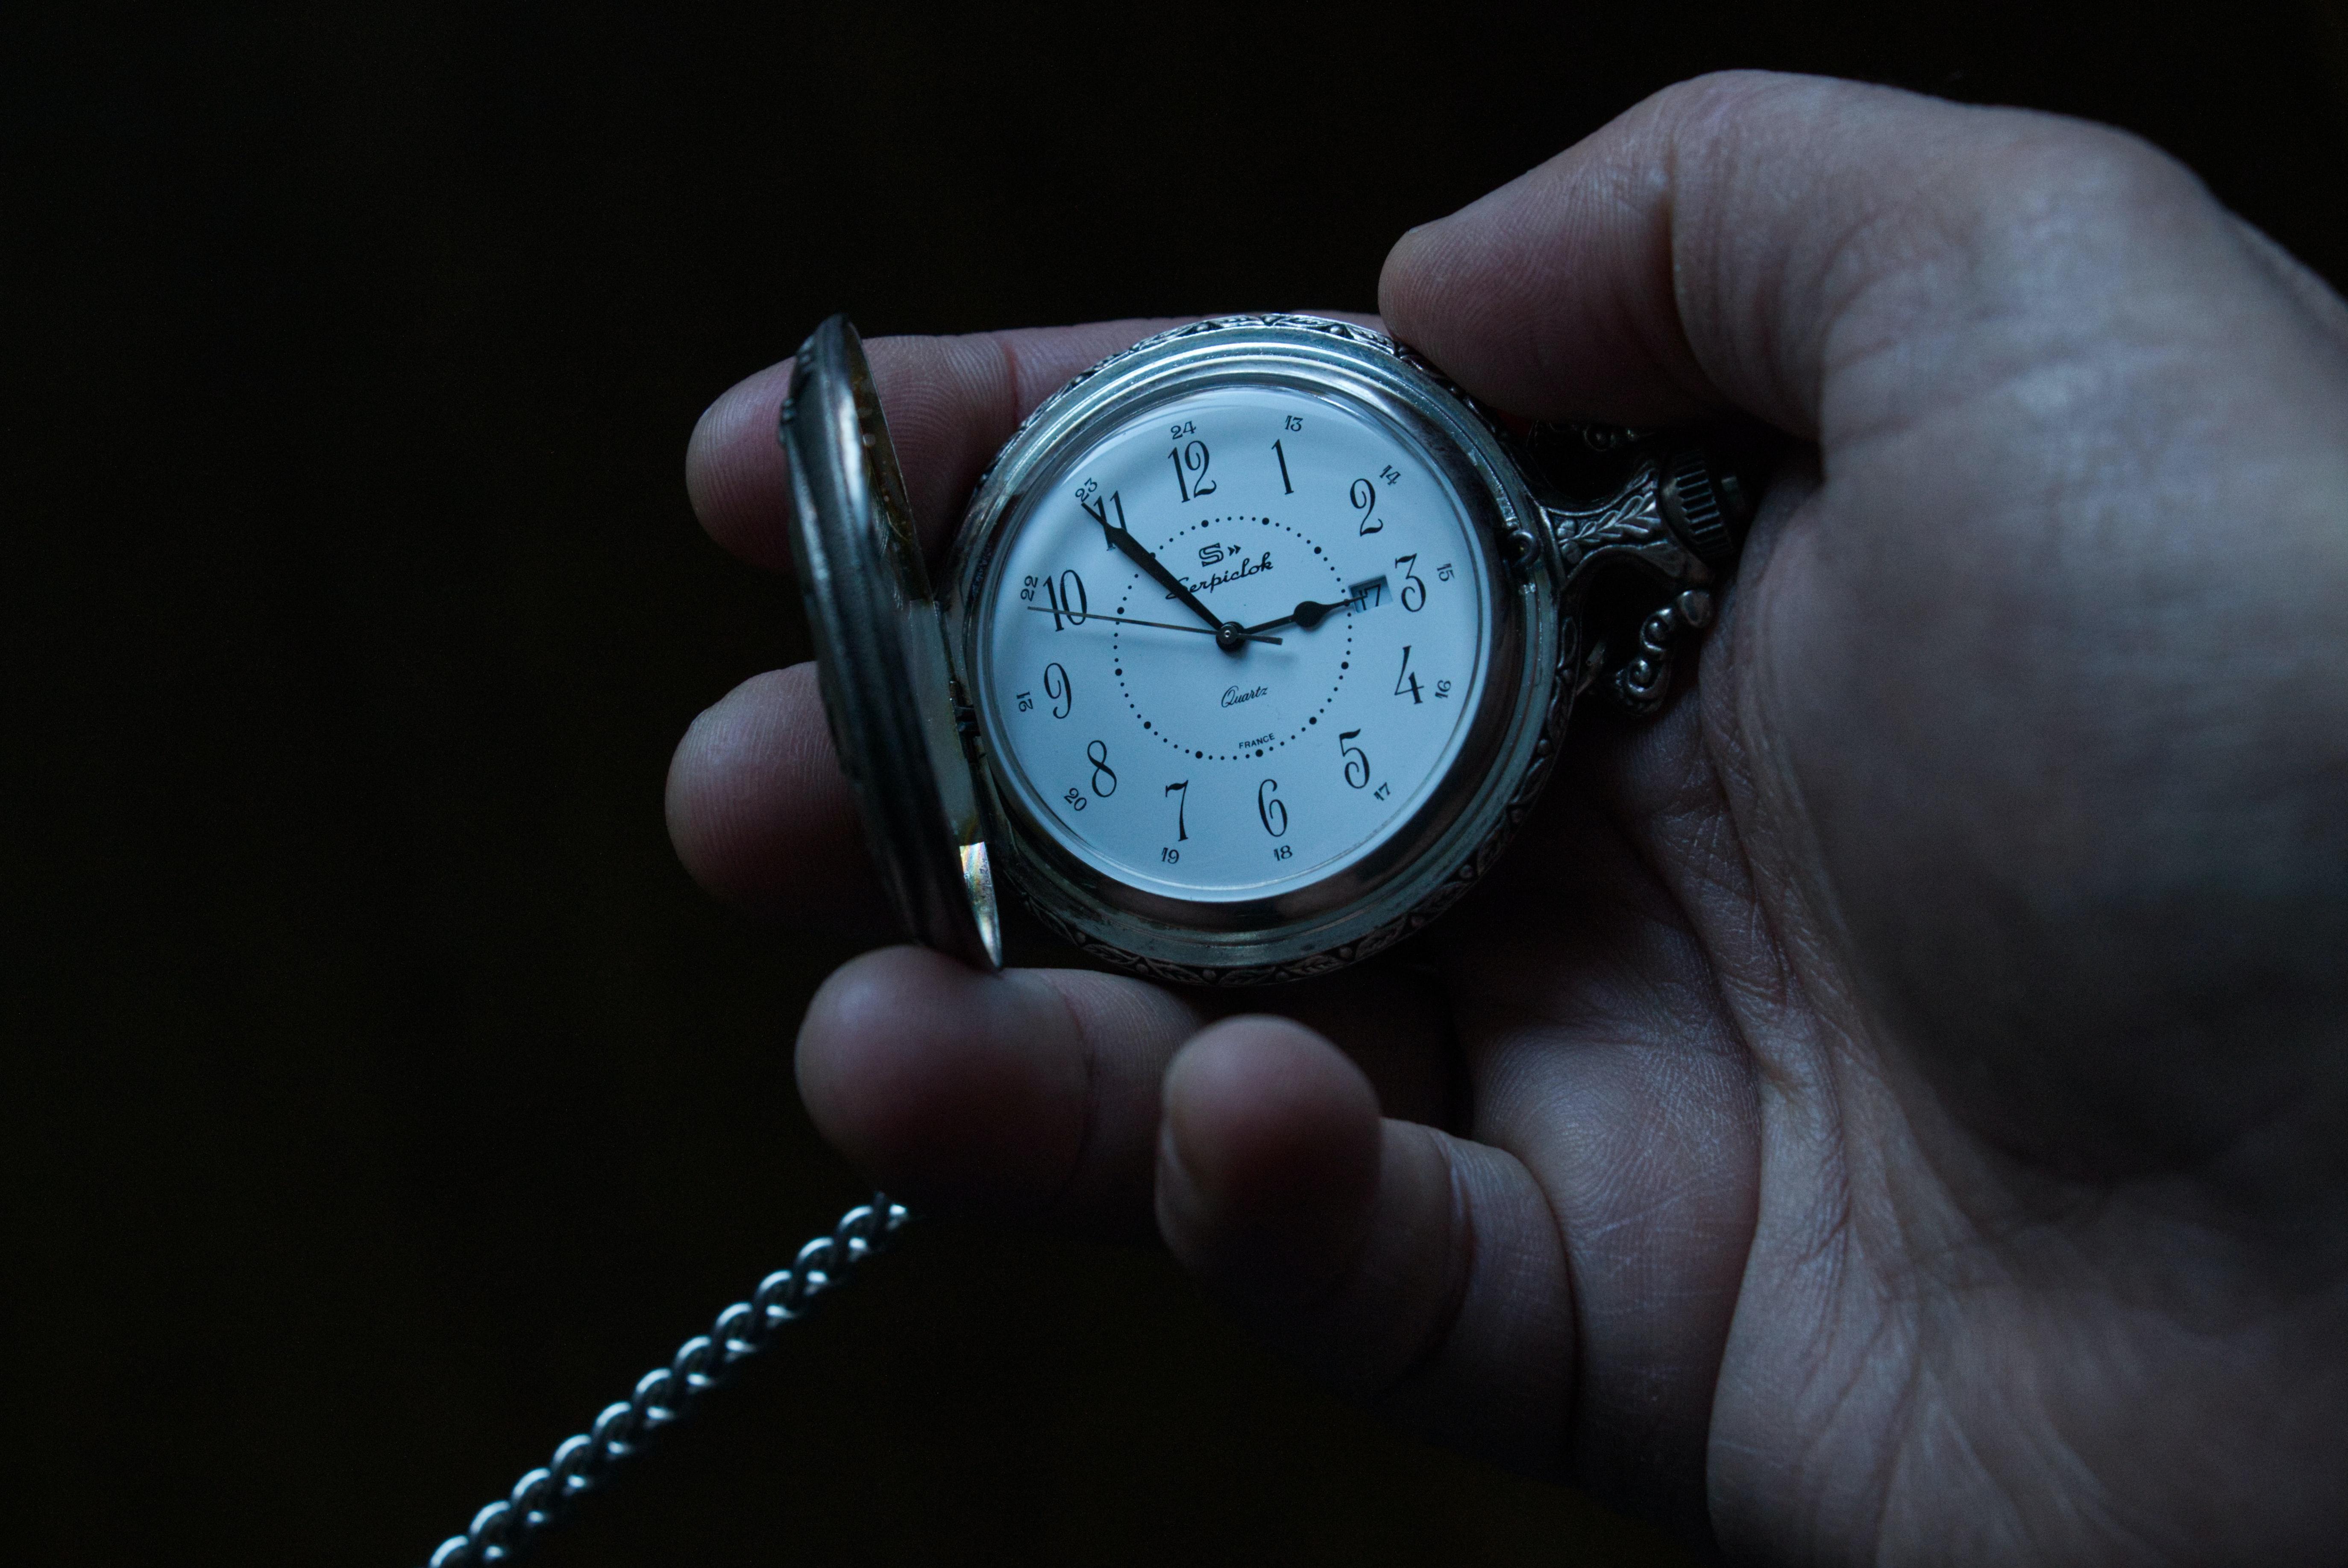 Wristwatch Late Photo by Pierre Bamin on Unsplash